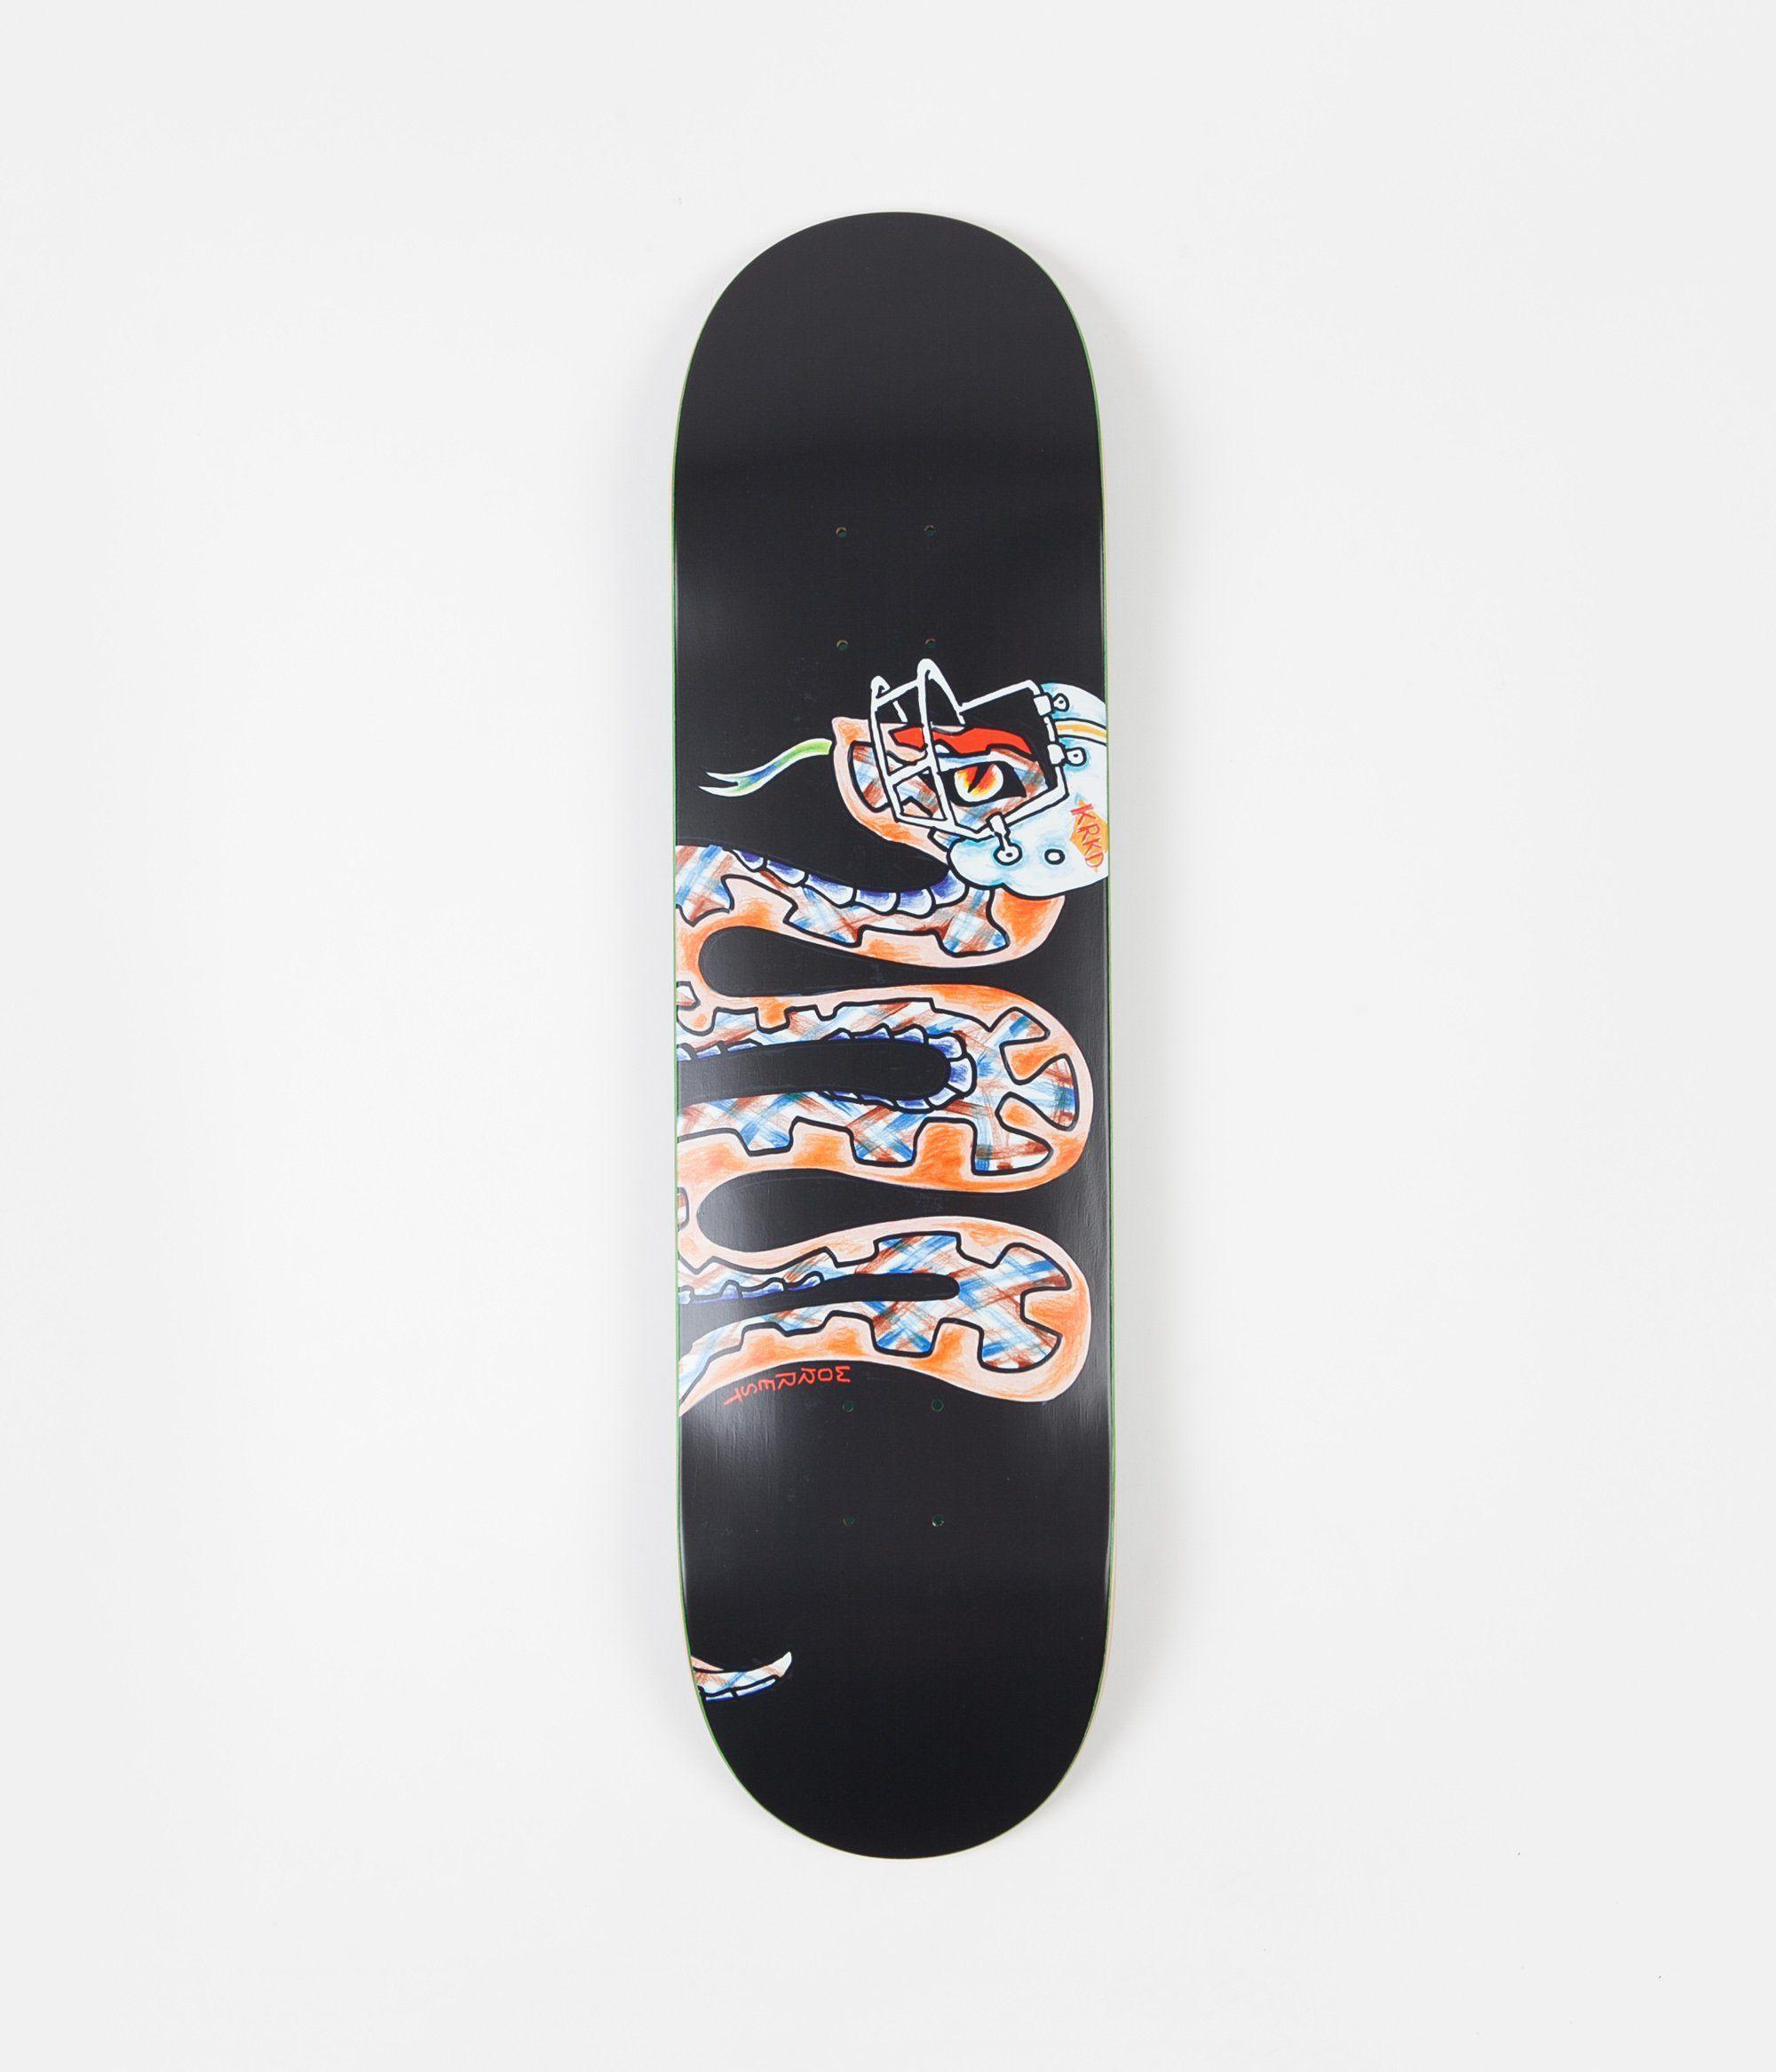 Krooked Worrest Mvp Pro Deck Black 8 12 Skateboards Skateboard Store Football Helmets Black